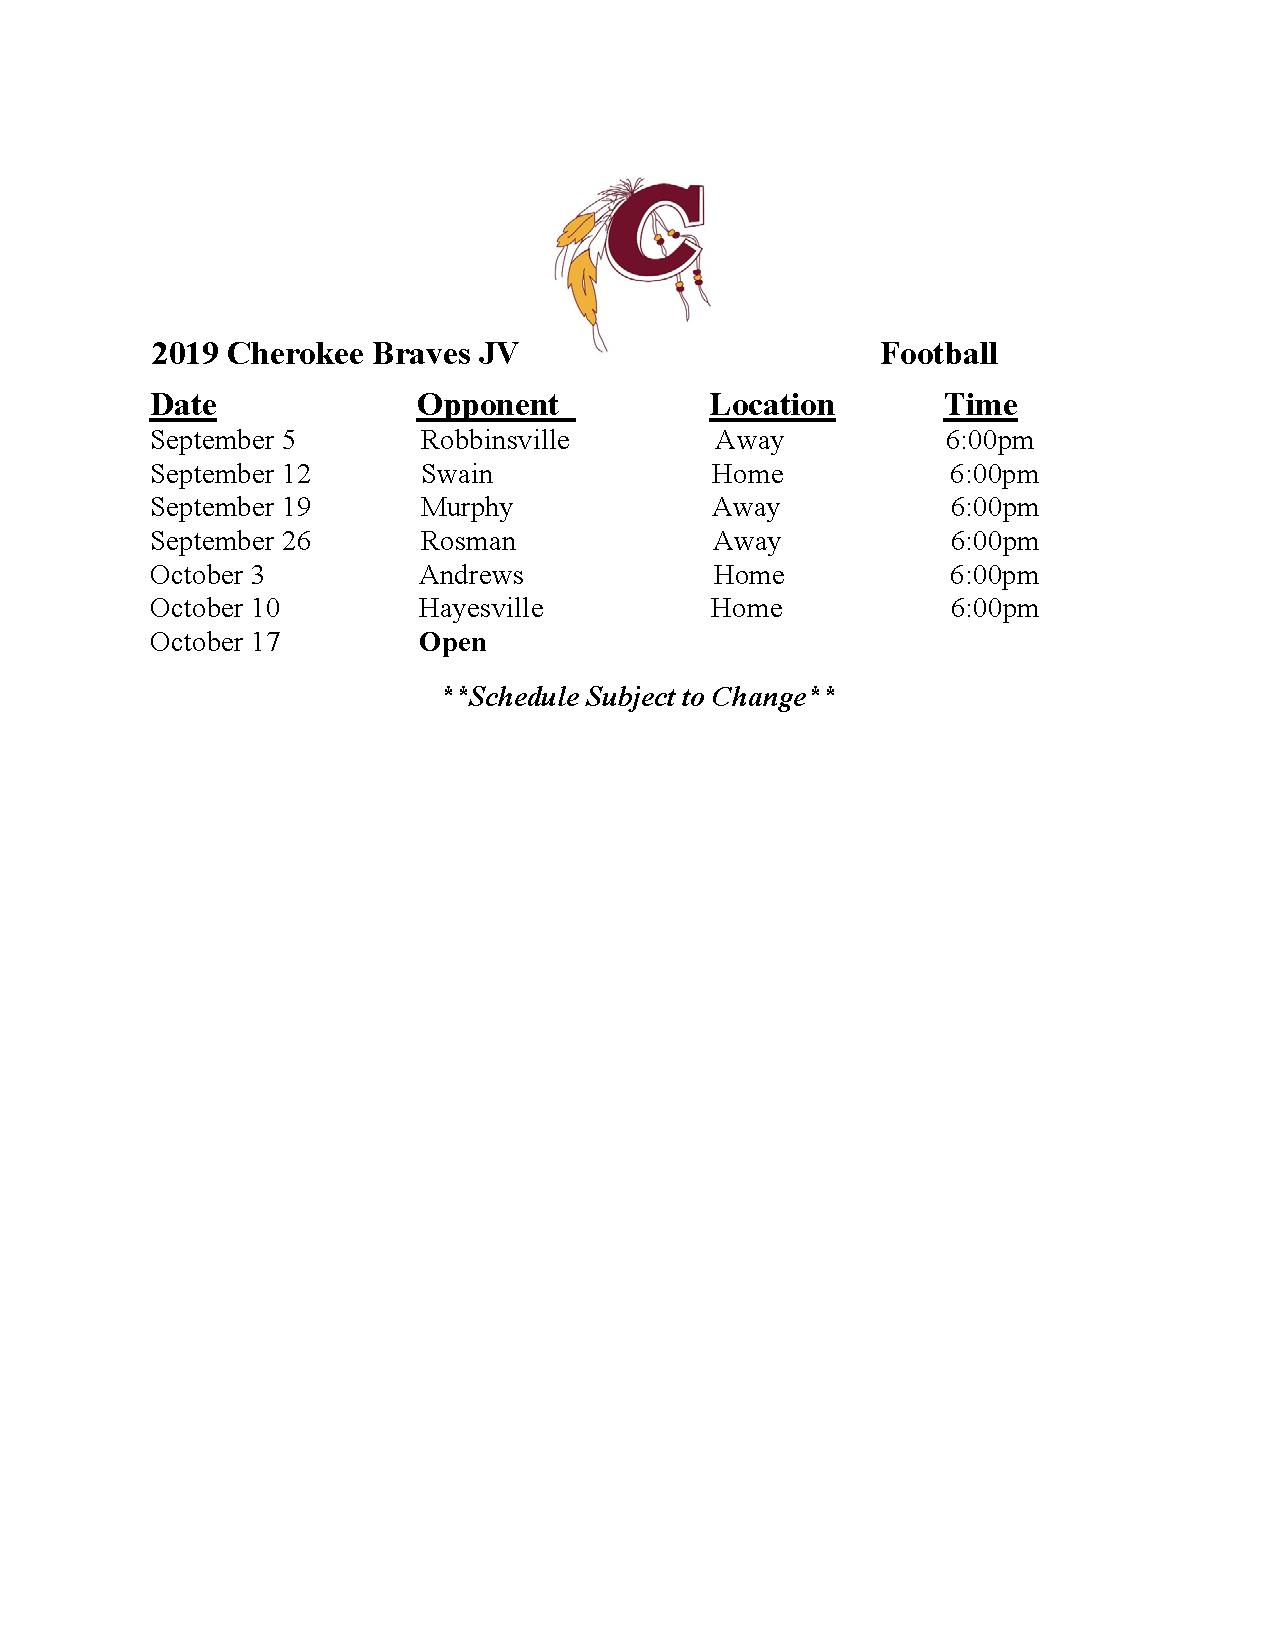 2019-2020 JV Football Schedule